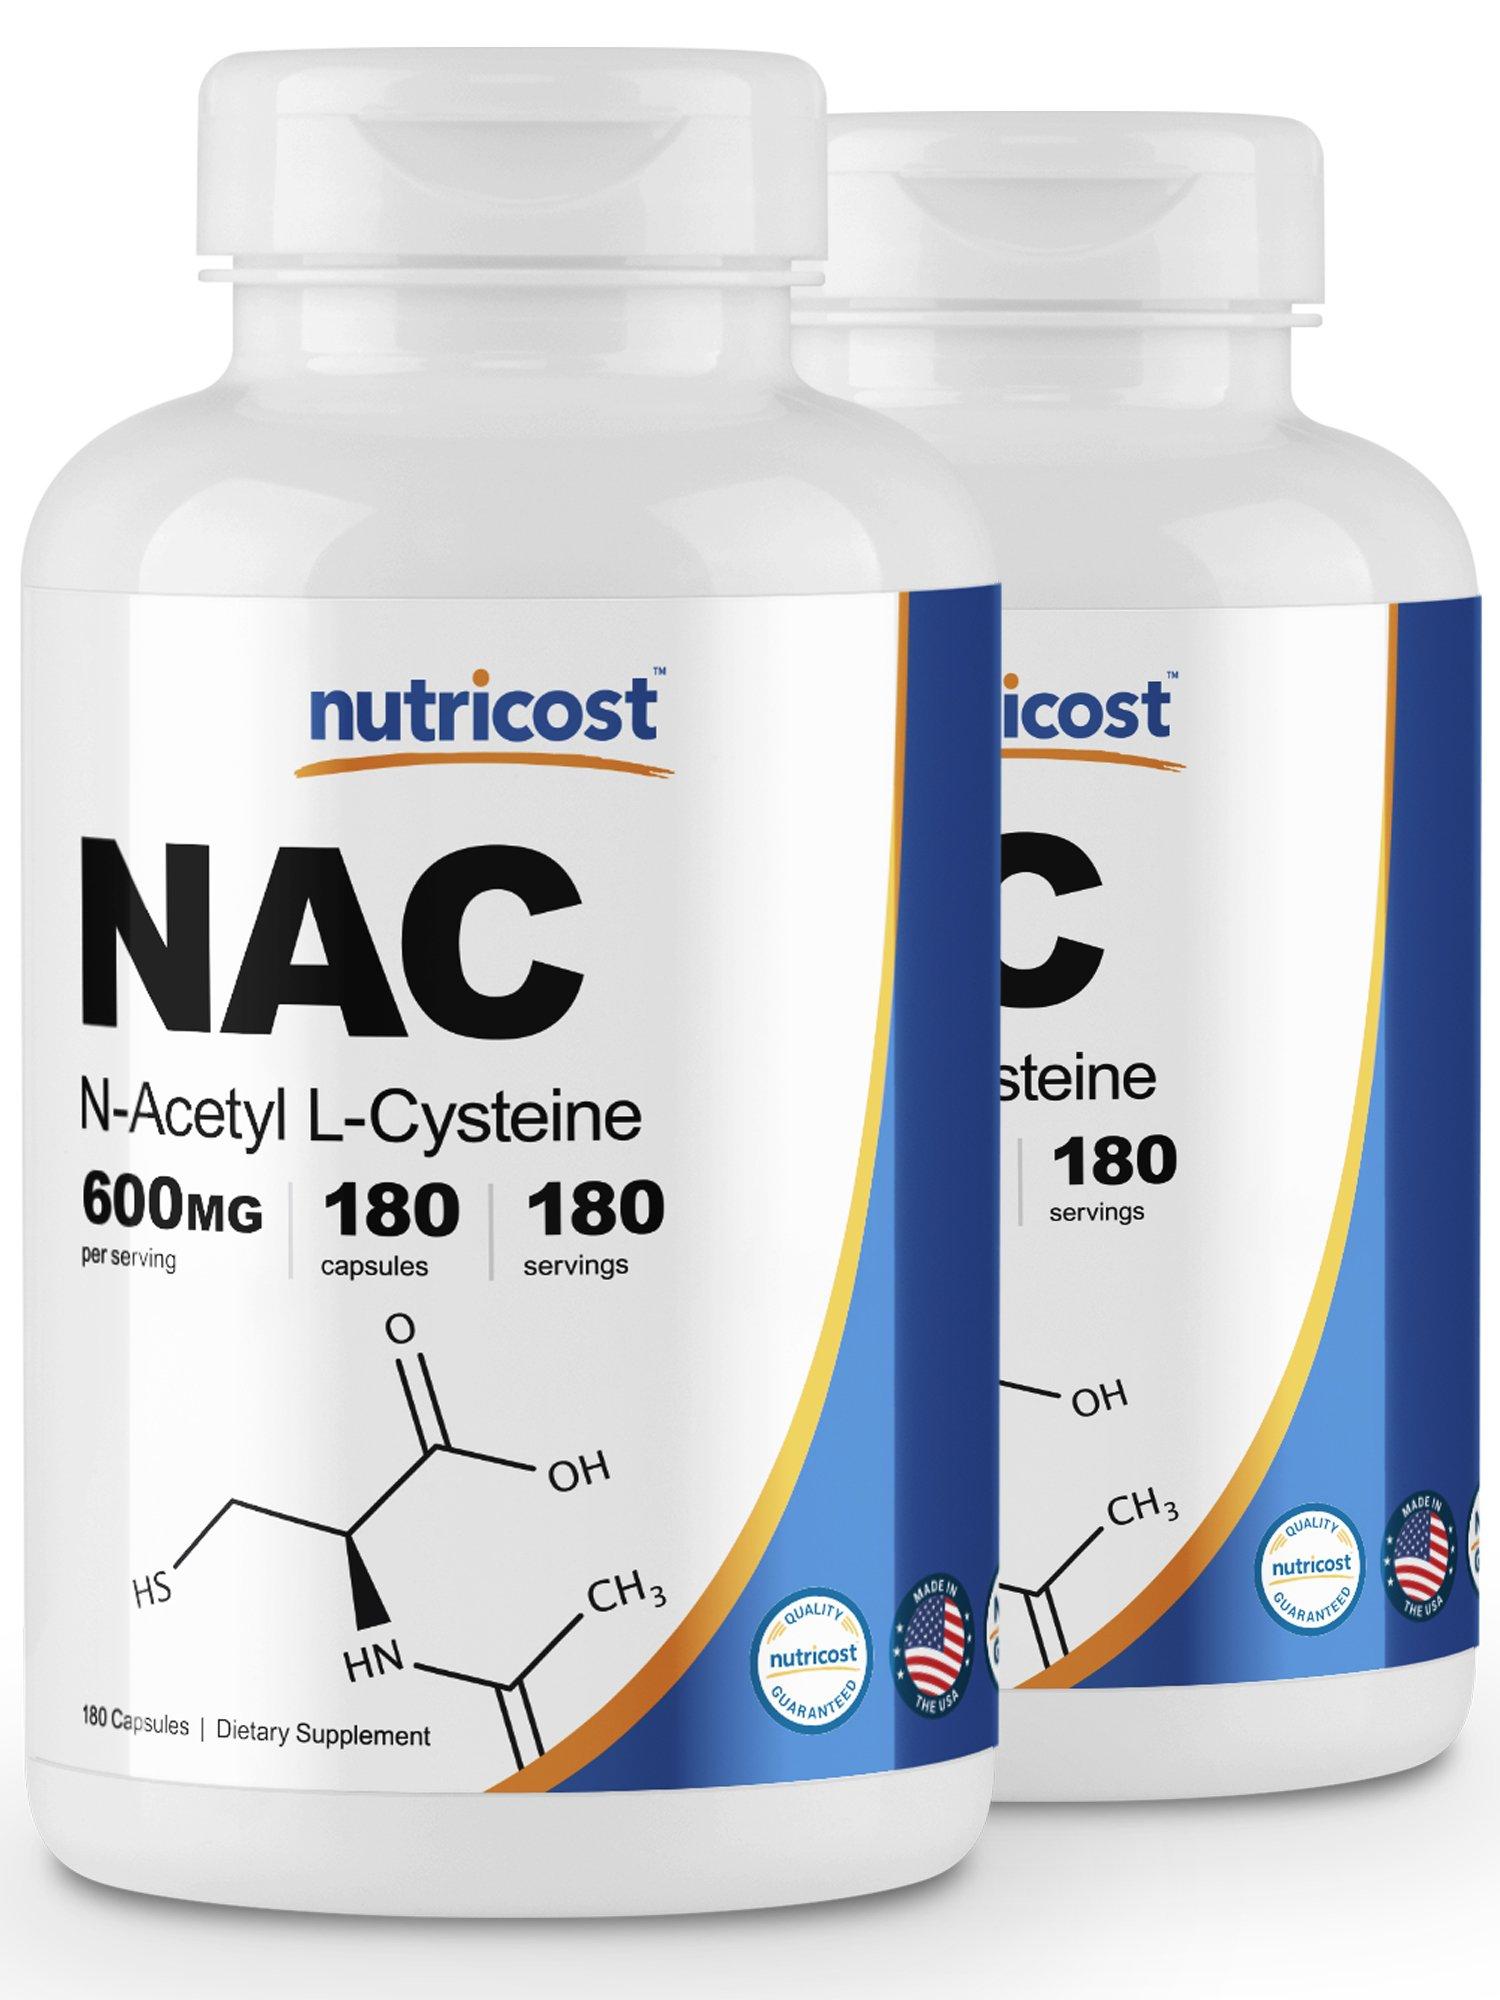 Nutricost N-Acetyl L-Cysteine (NAC) 600mg; 180 Caps (2 Bottles)